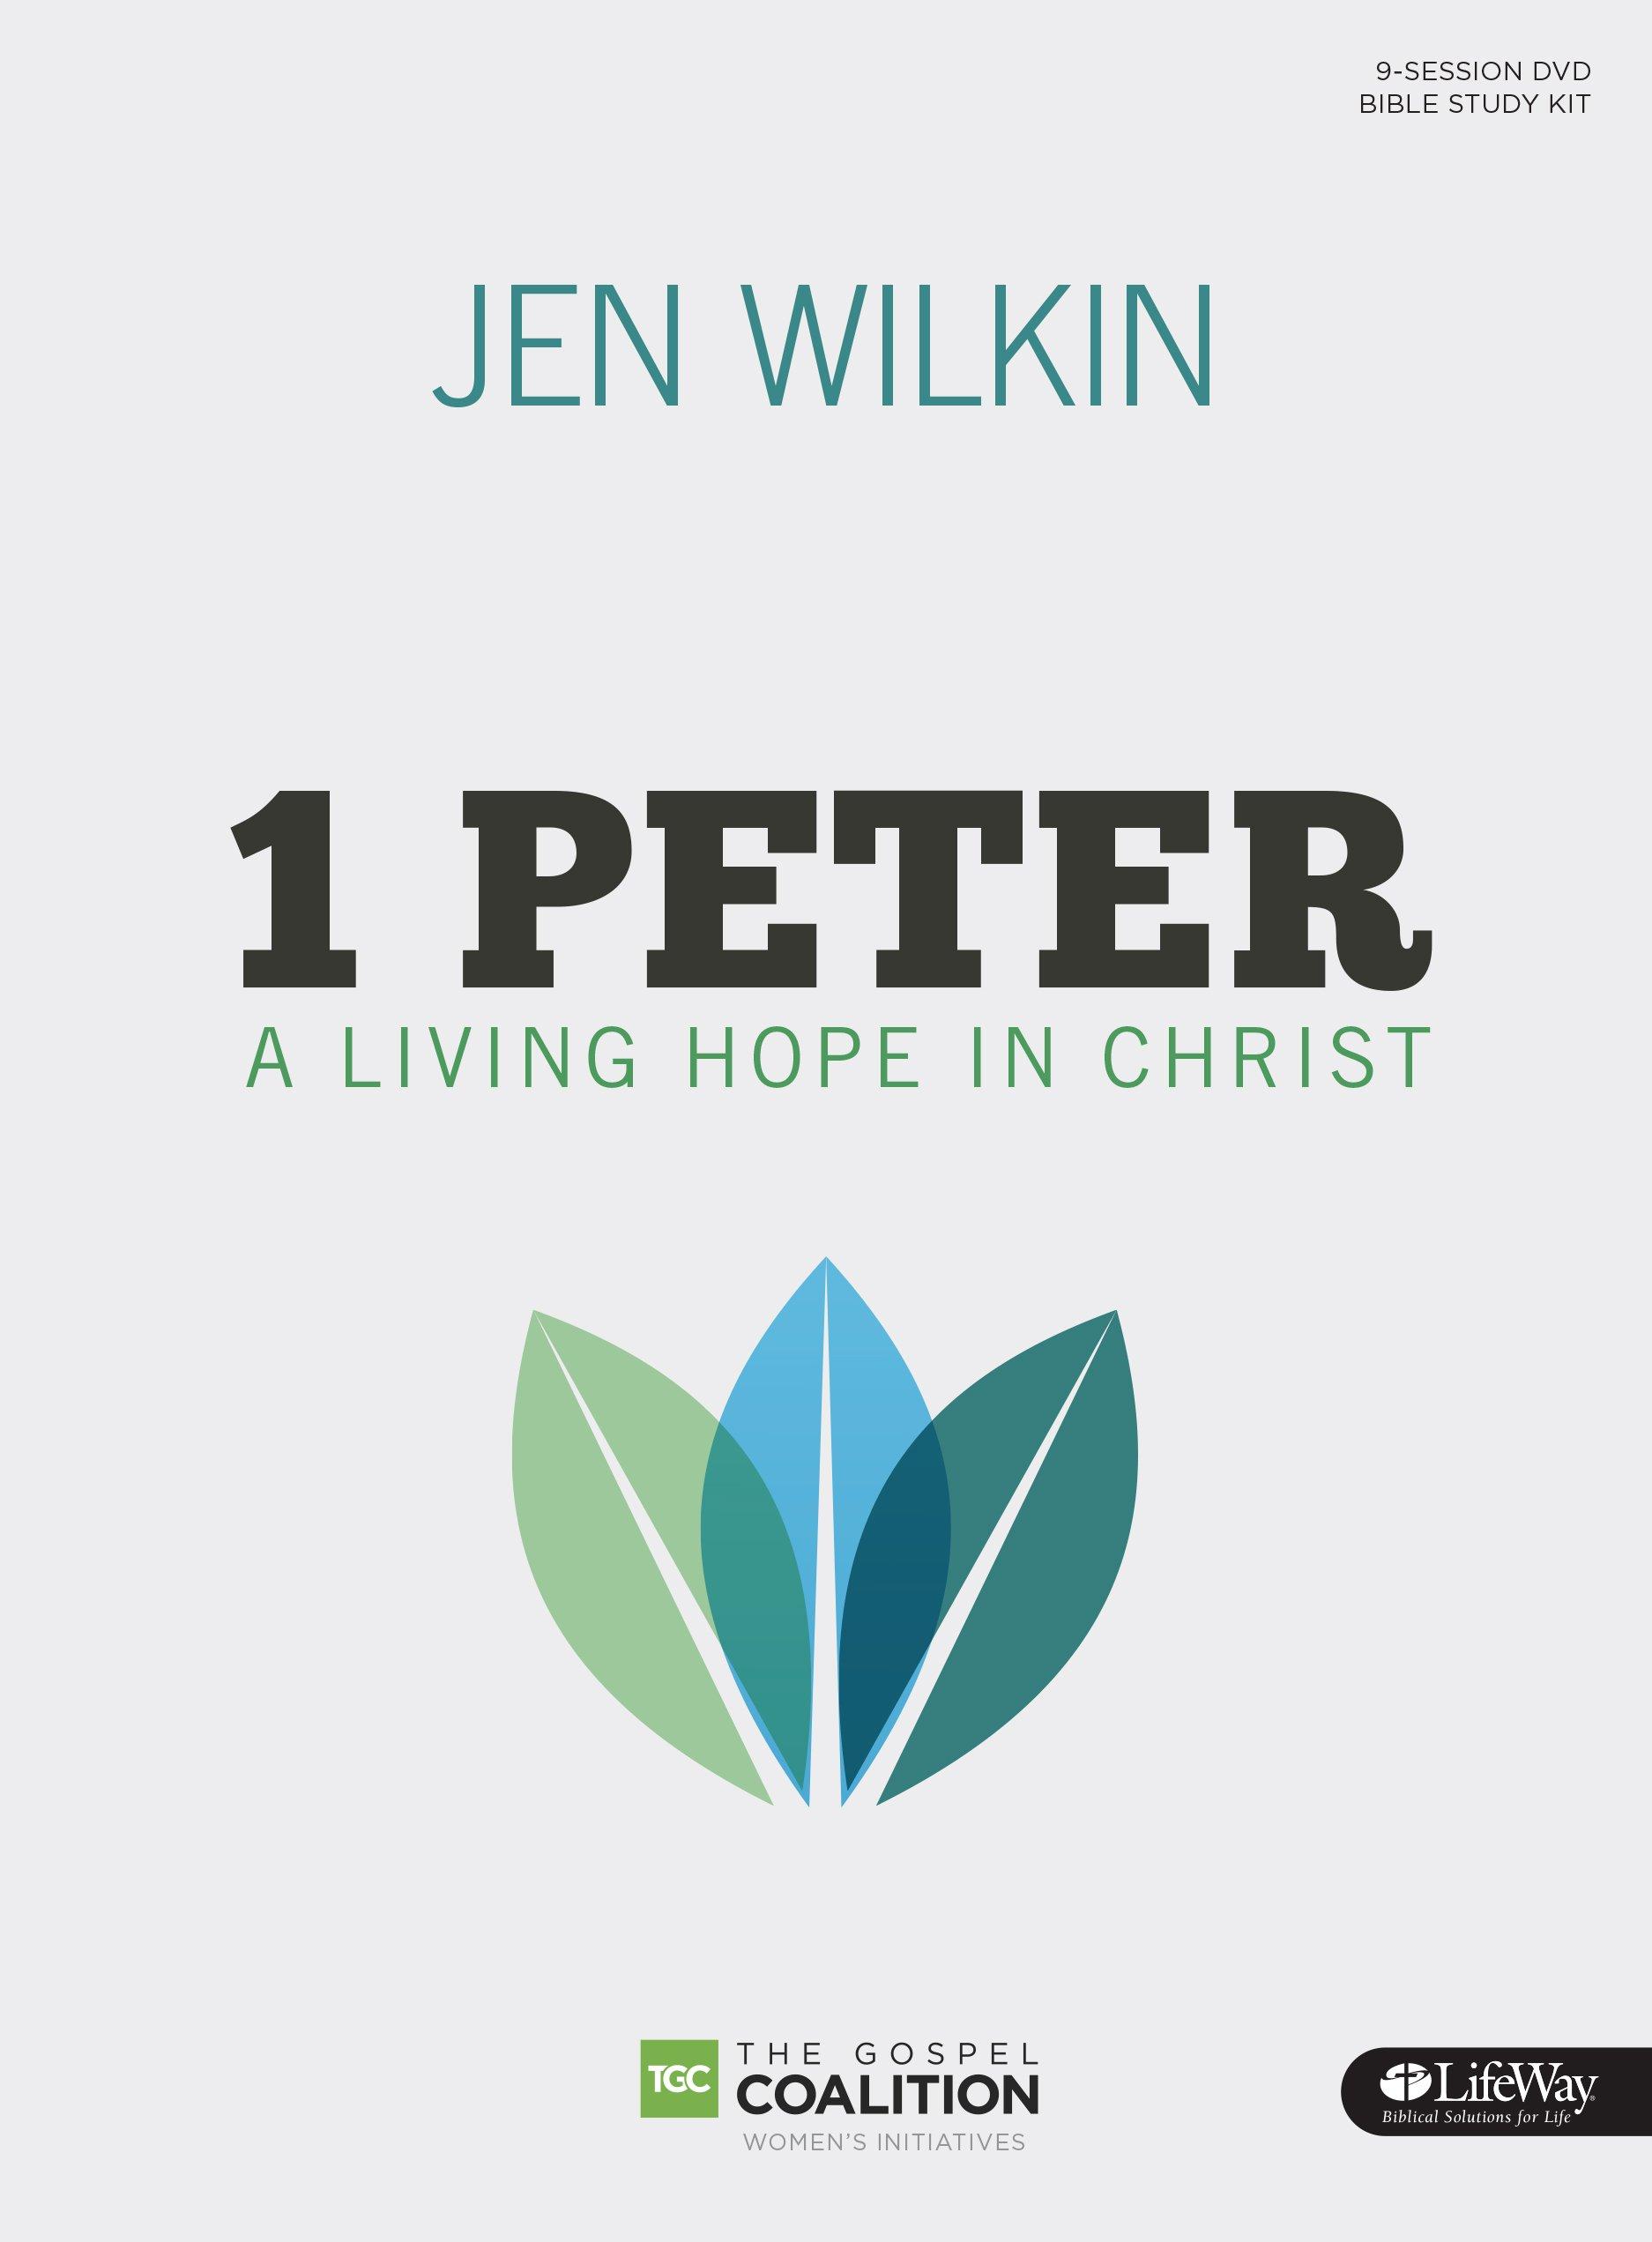 1 Peter: A Living Hope in Christ - Leader Kit